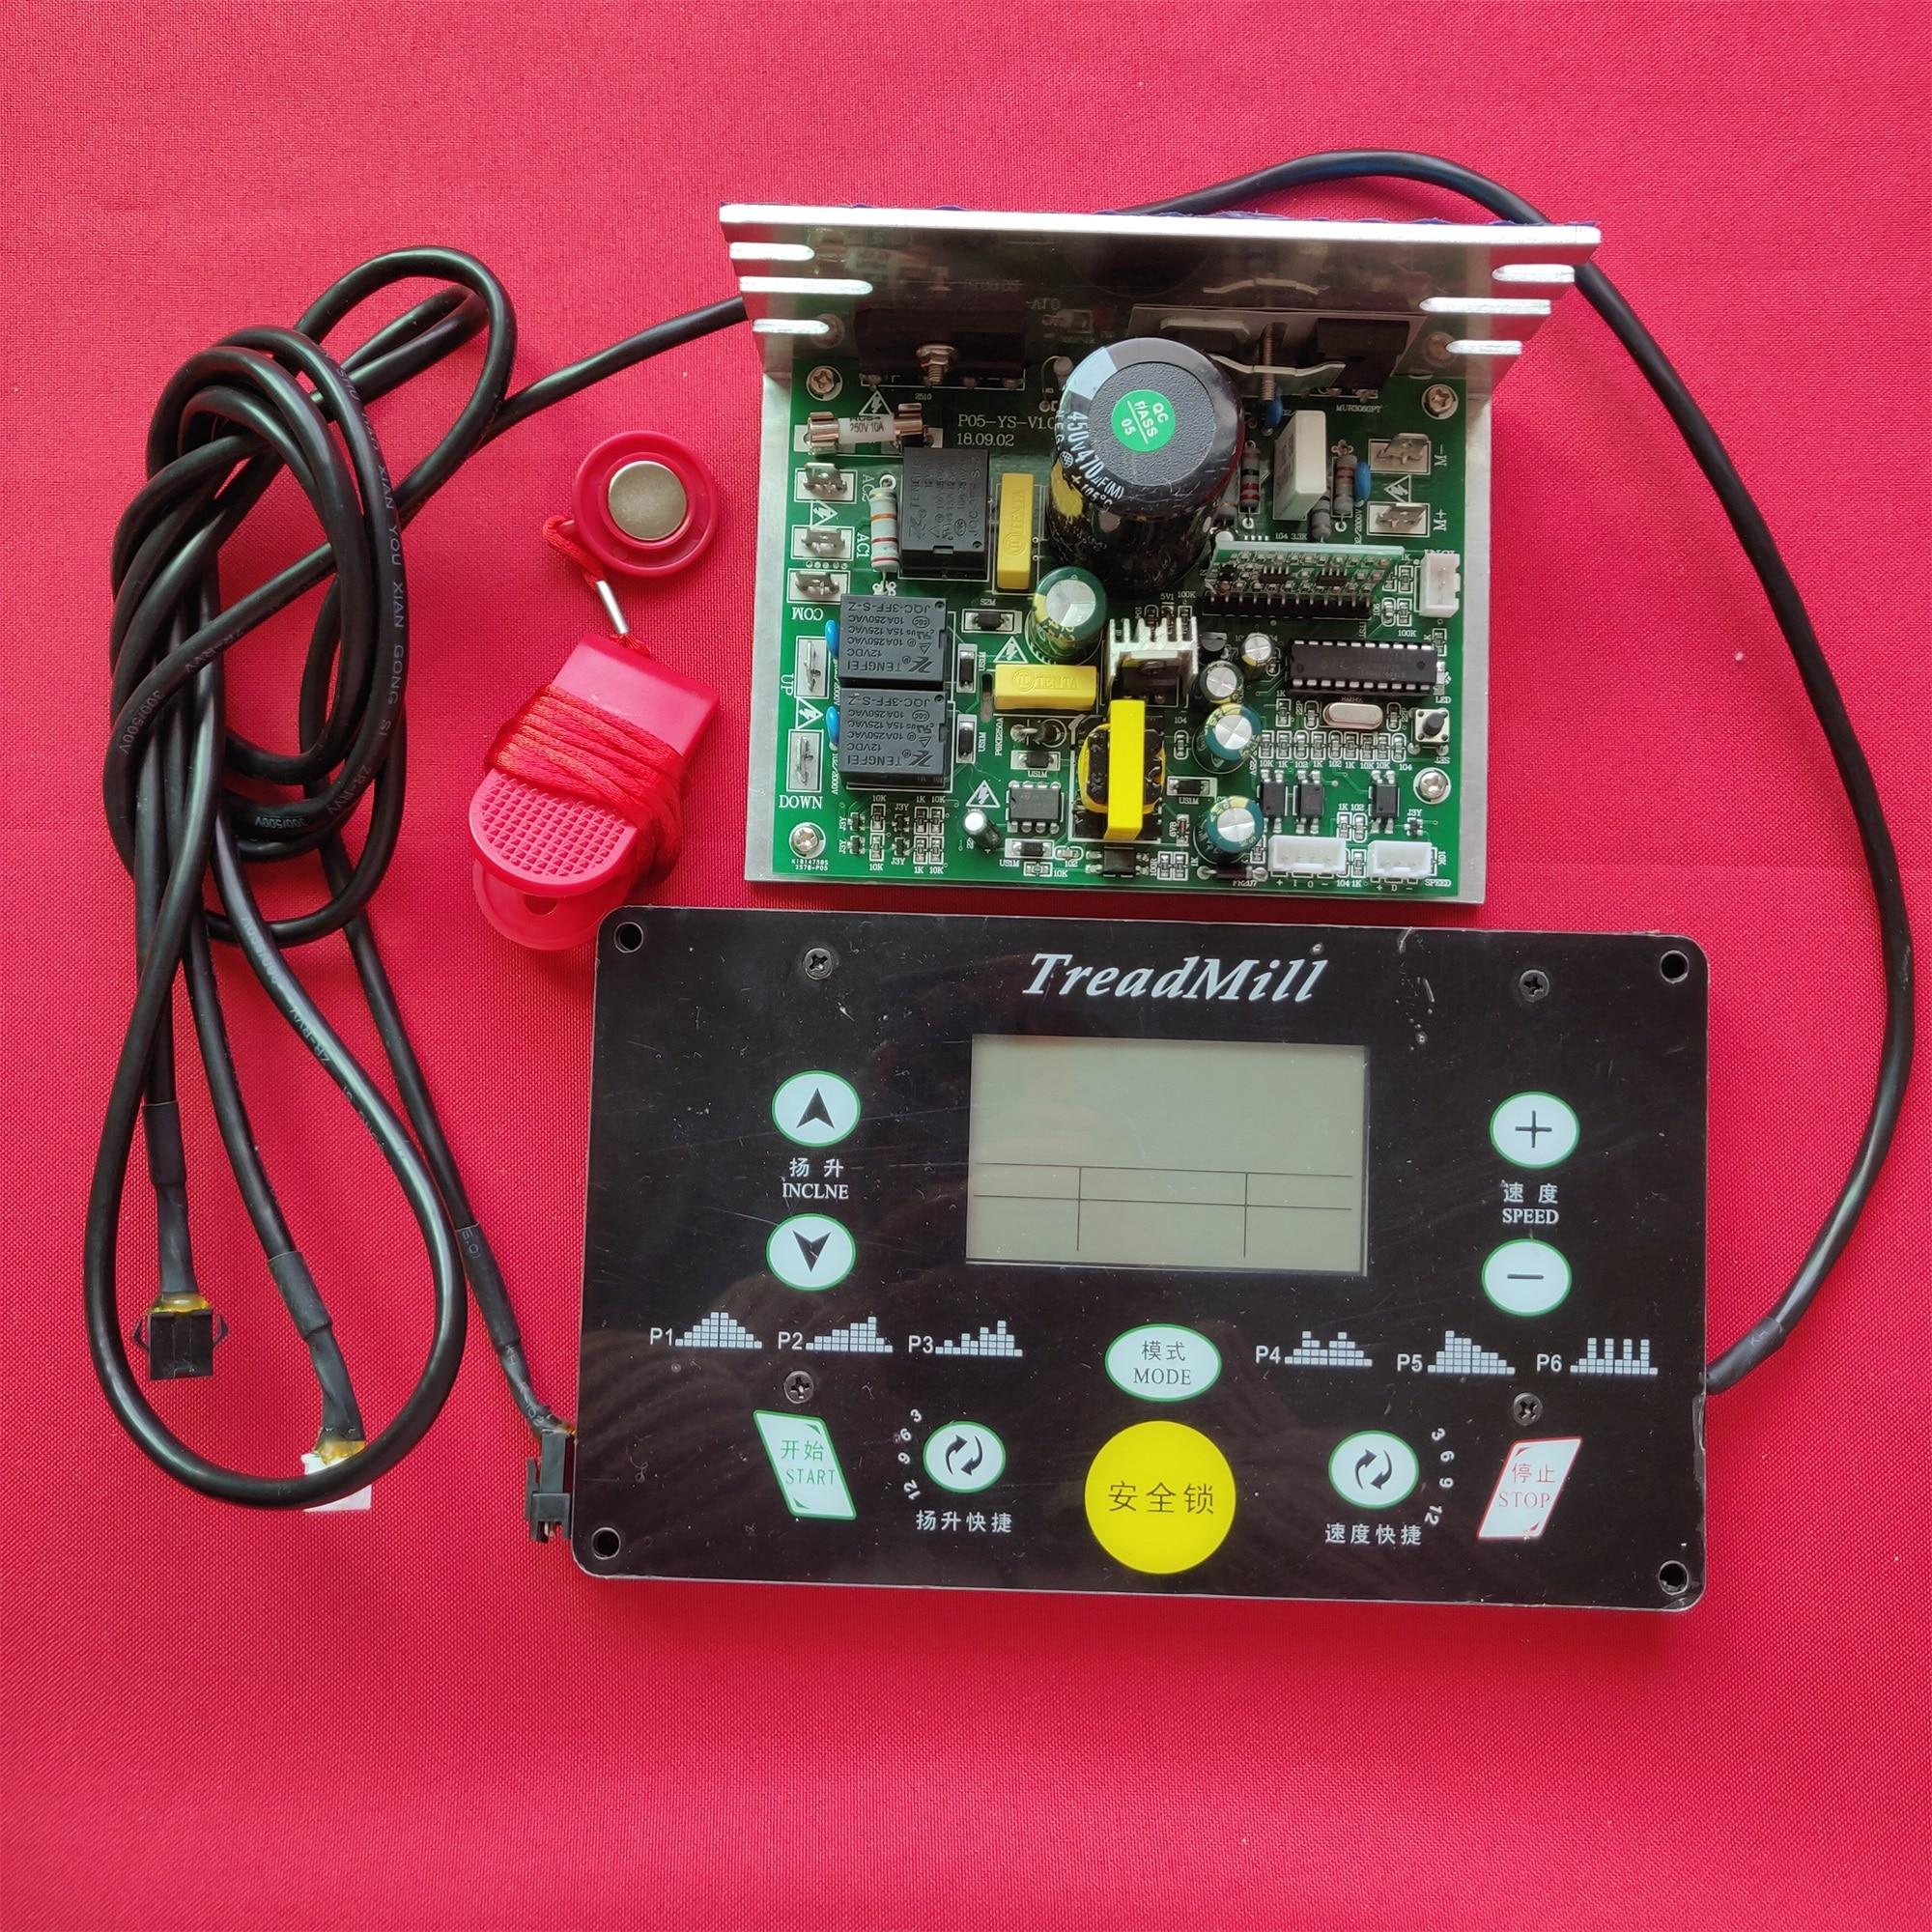 General Use Treadmill Circuit Board Treadmill Console Display Treadmill Motor Control Board Controller 1HP-2.0HP/1HP-4.0HP Motor